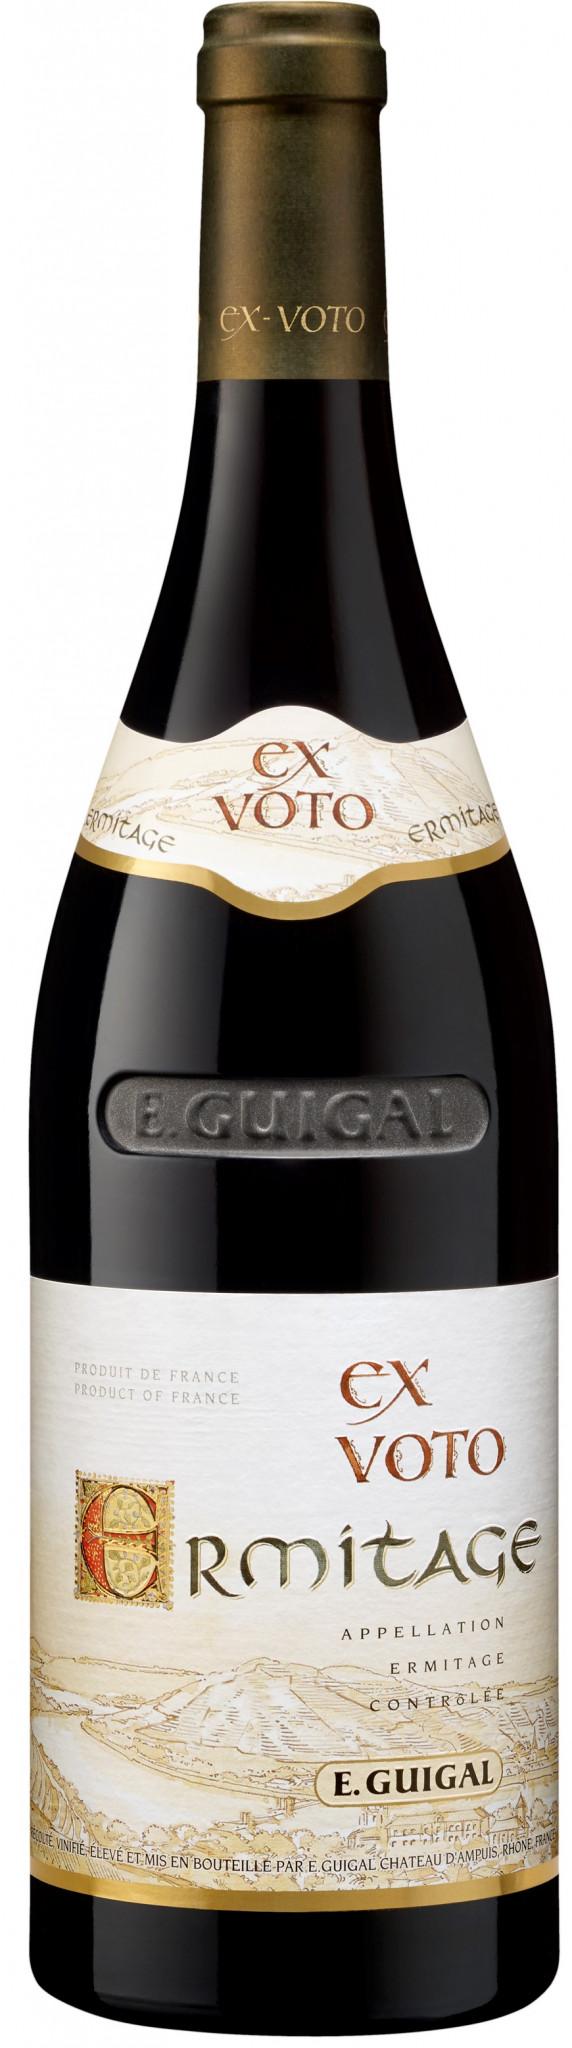 Guigal-Ermitage-Ex-Voto-Rouge_wineaffair